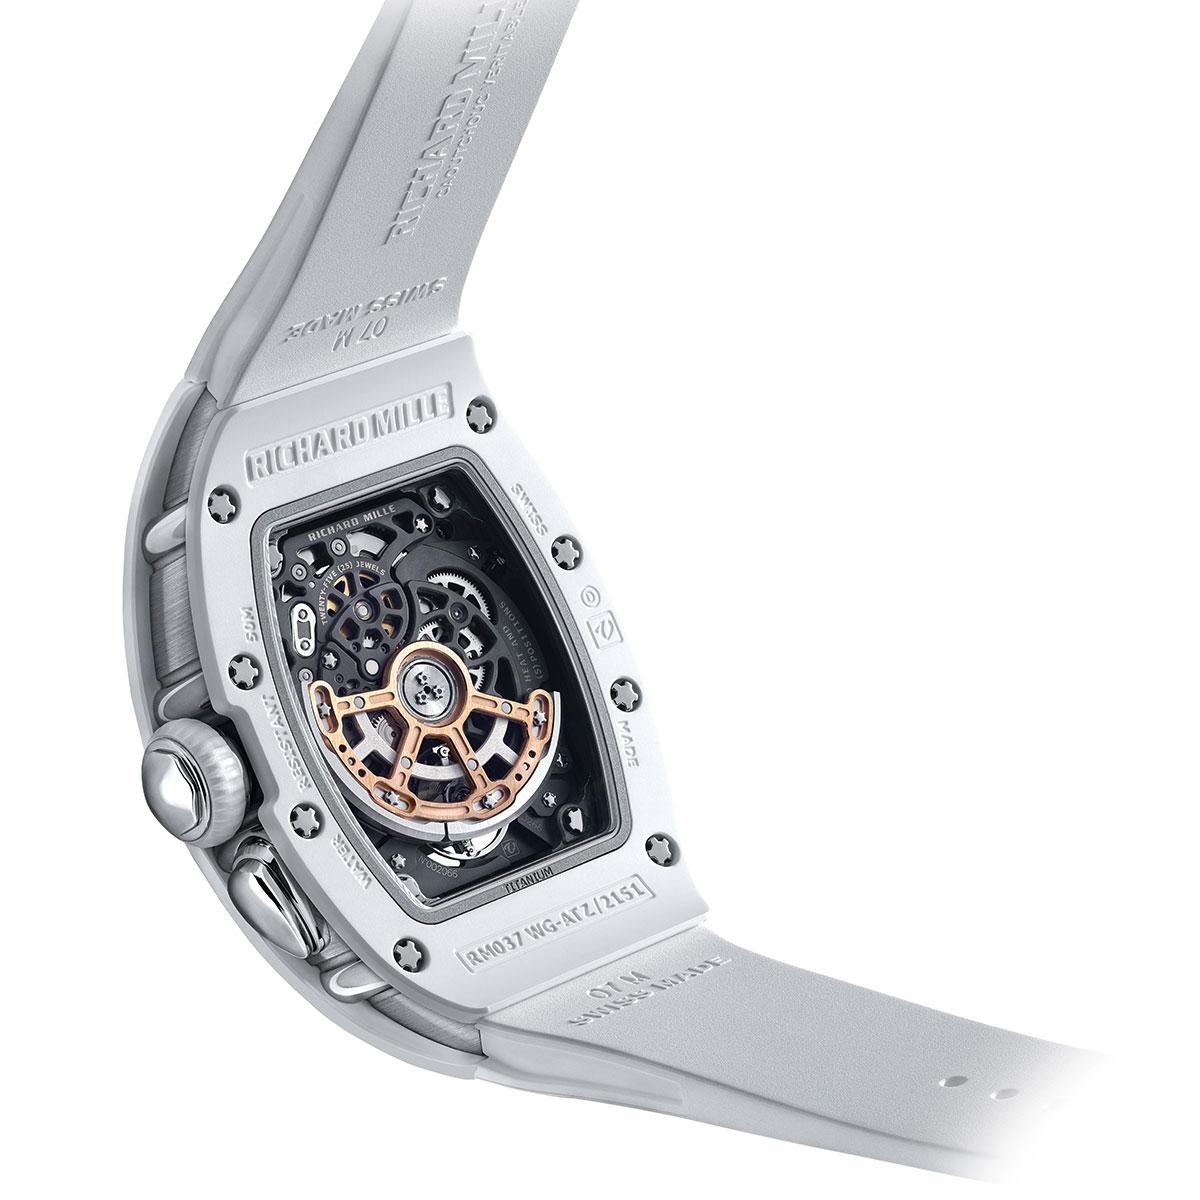 Đồng hồ Richard Mille RM 037 White Ceramic Automatic 1